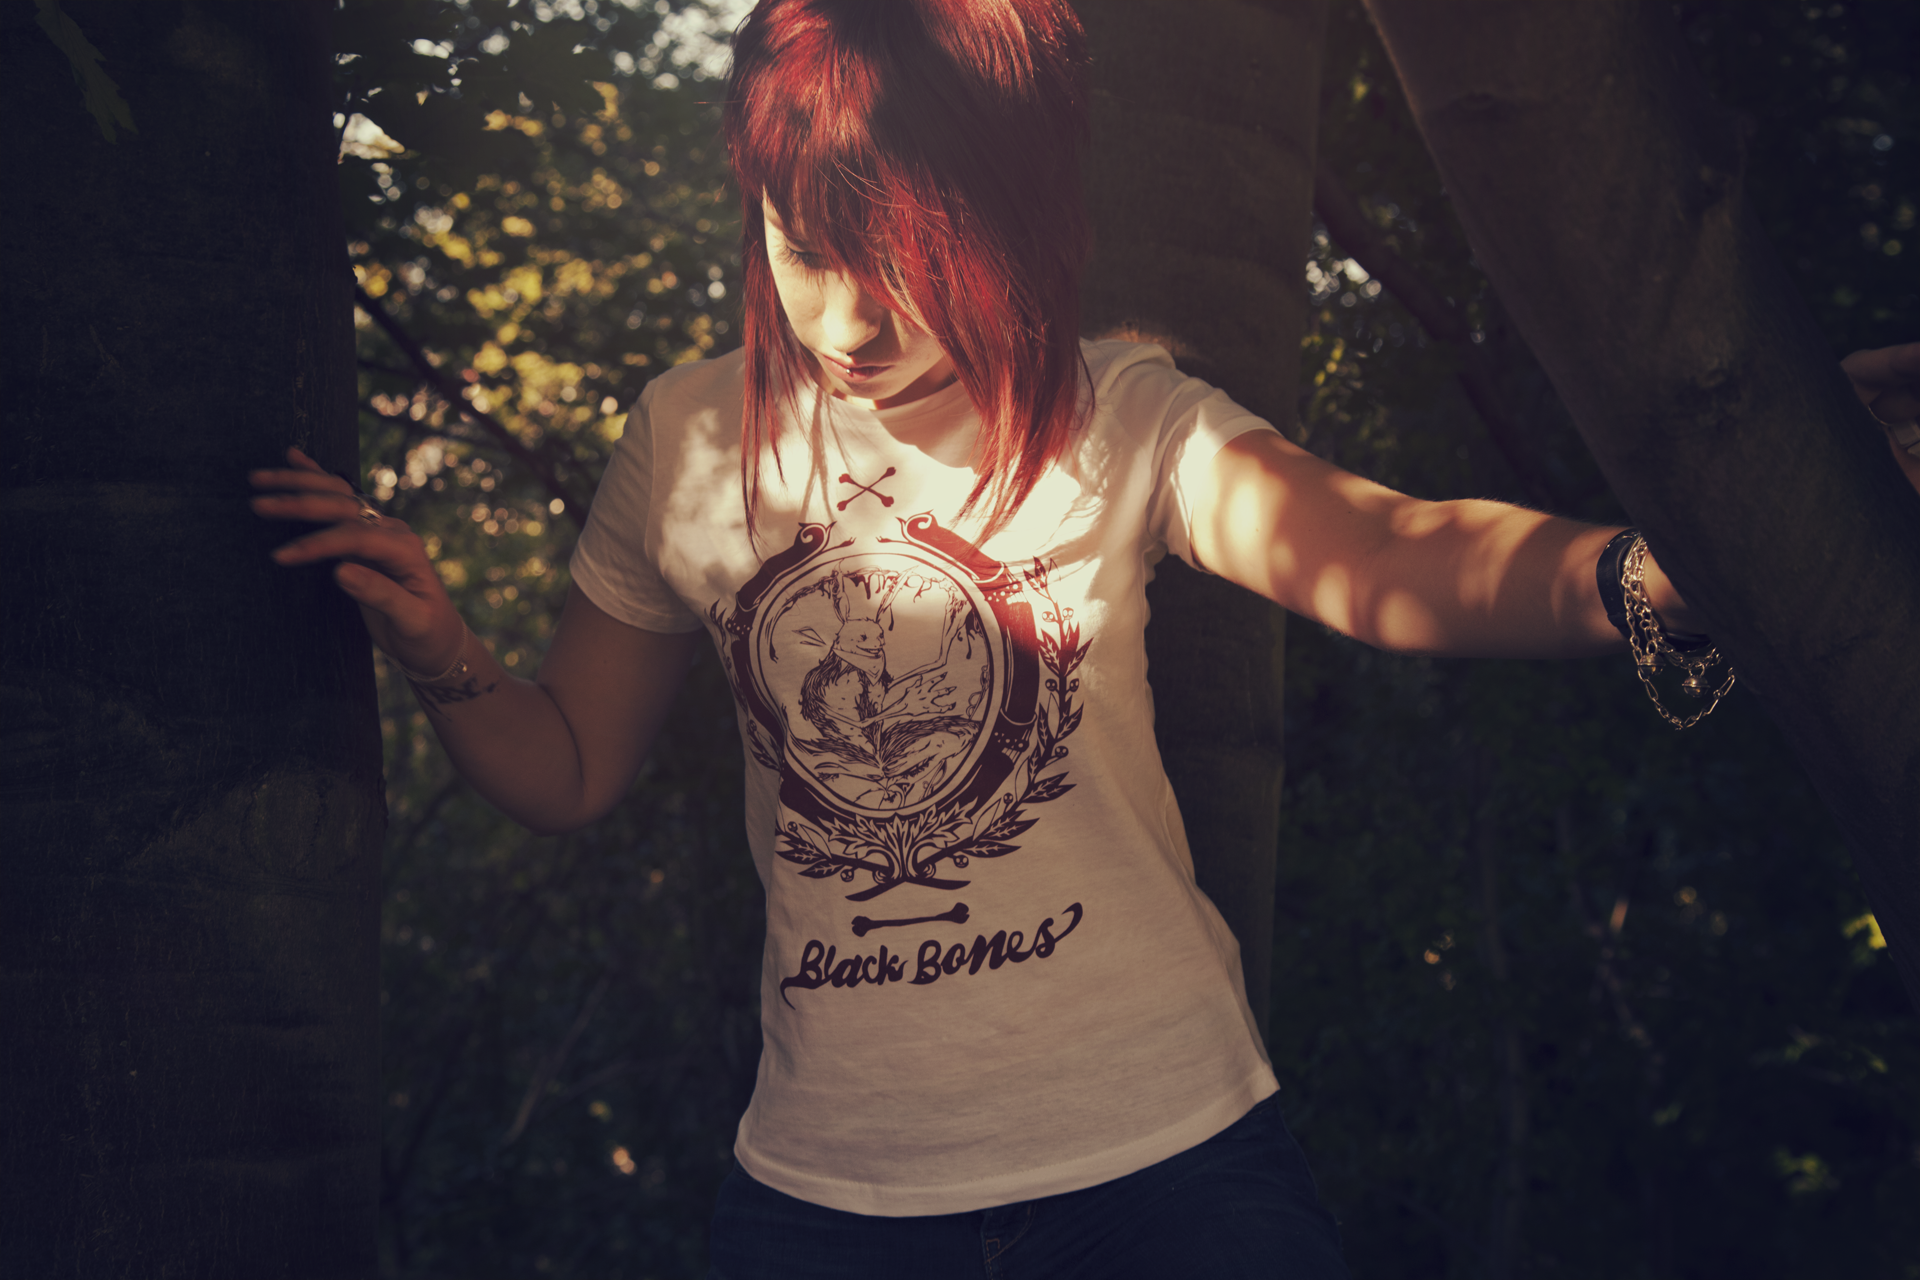 black bones t-shirt blanc femme